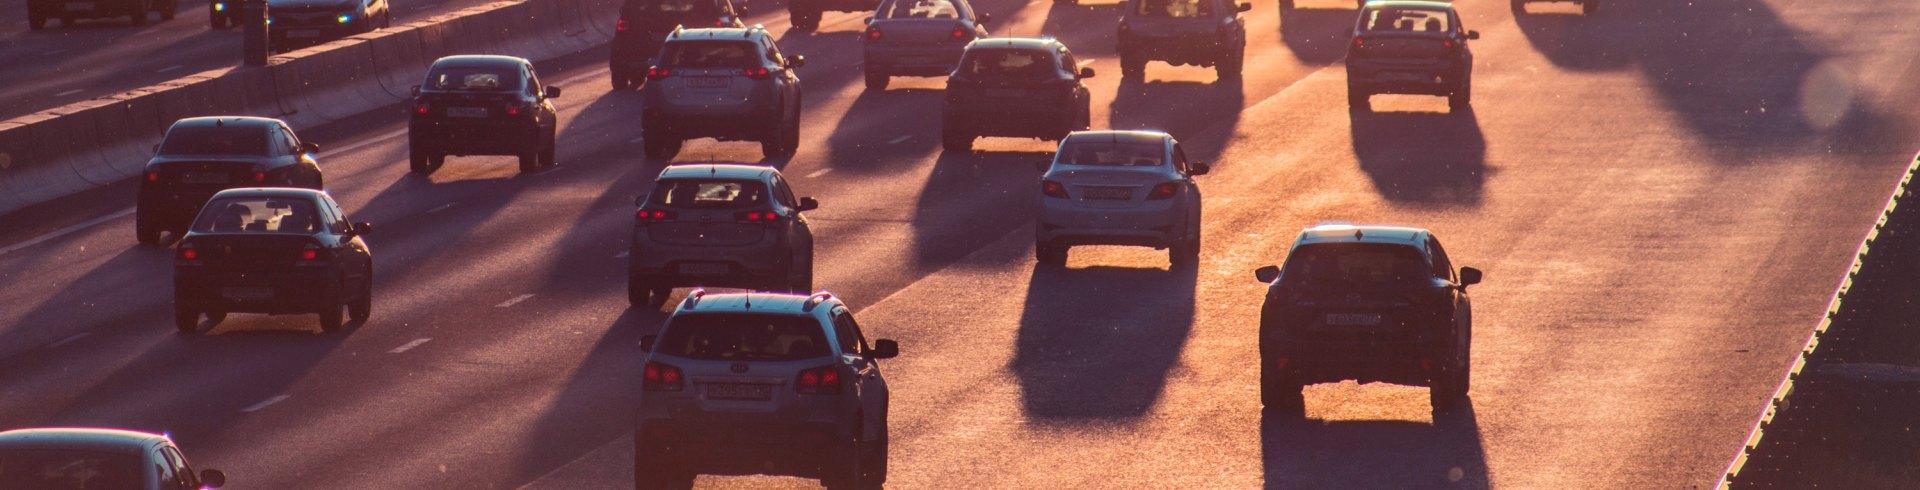 Verkehr Photo by Alexander Popov on Unsplash